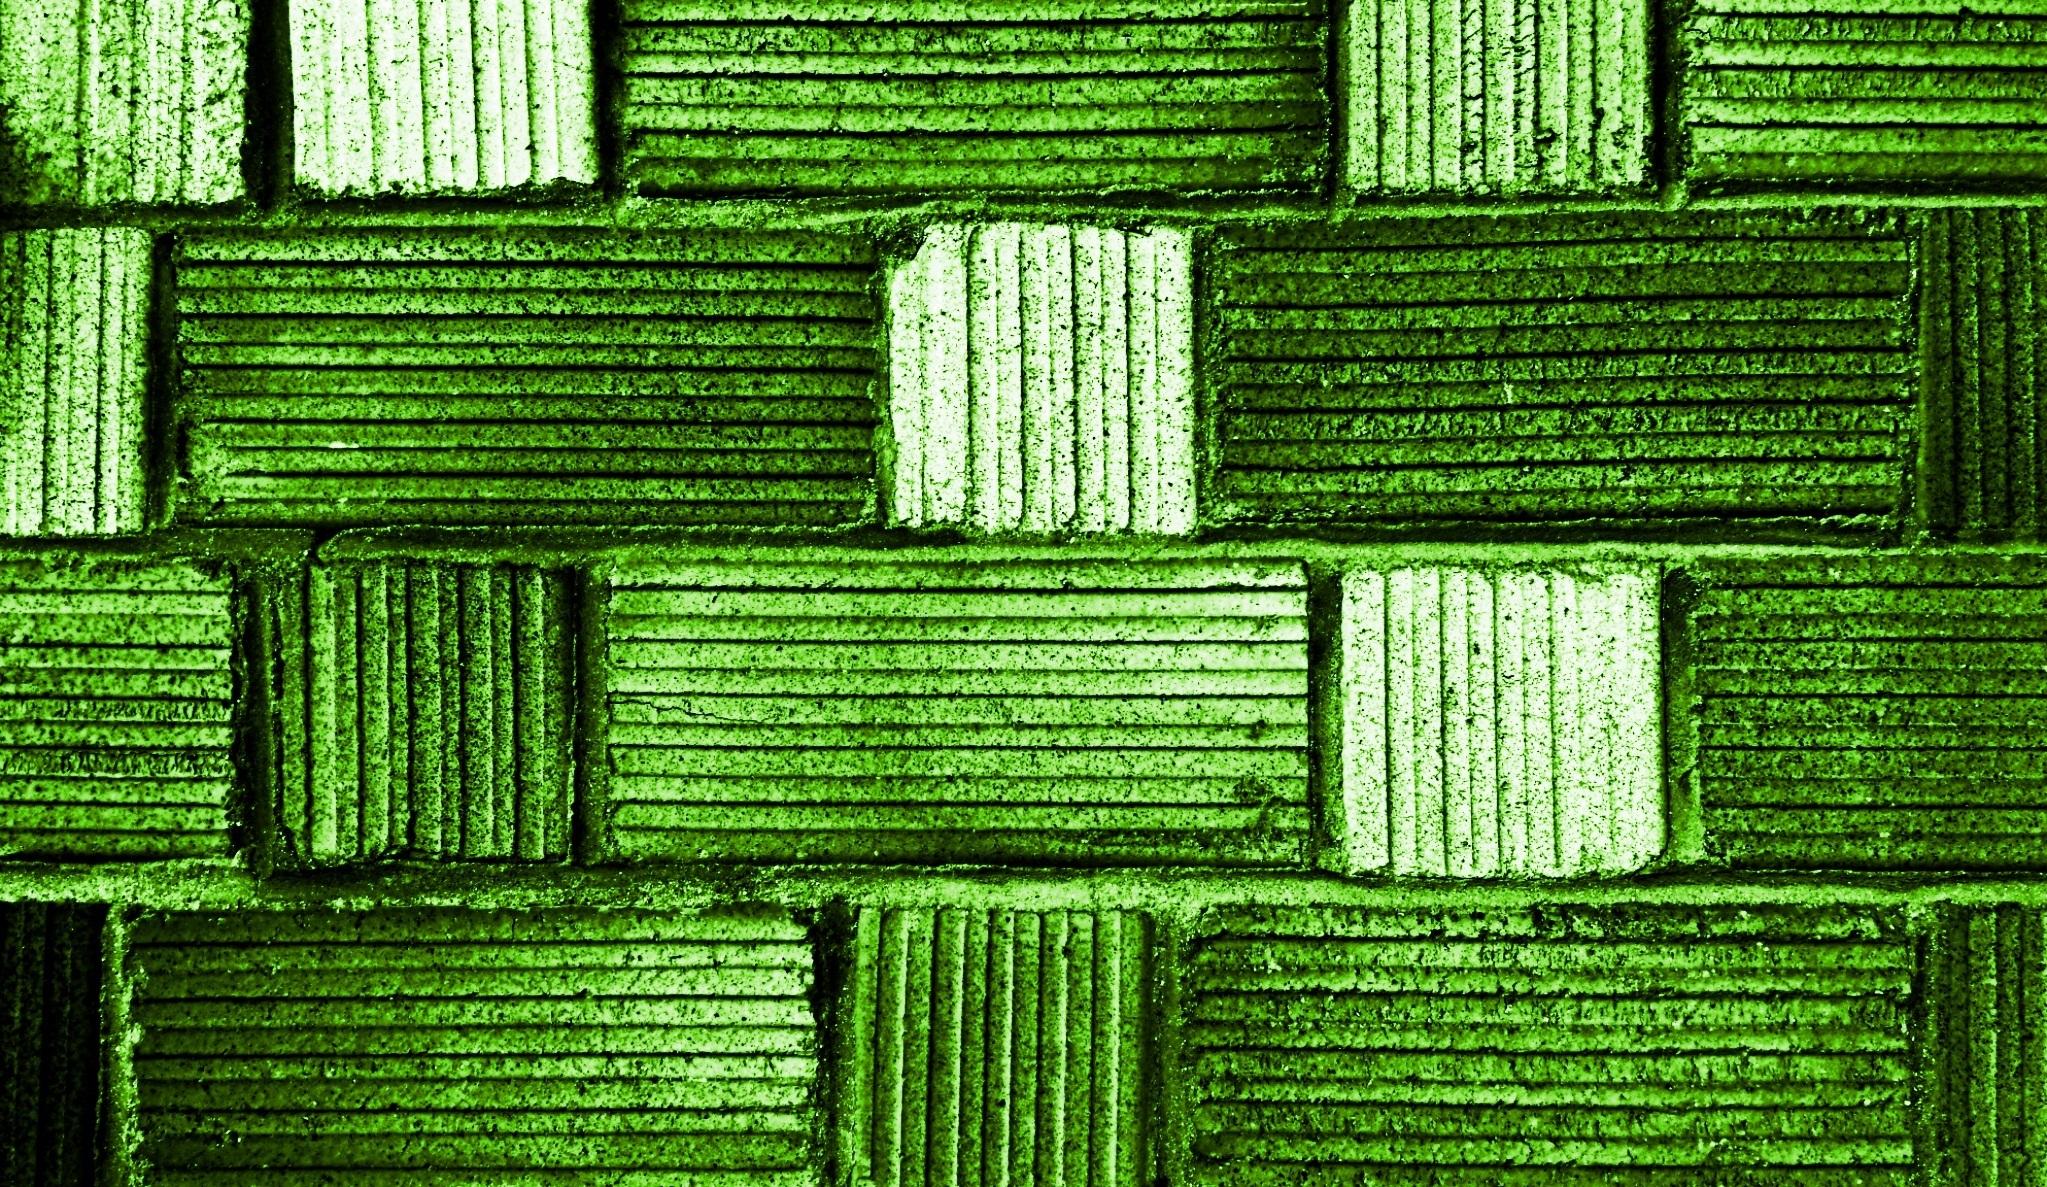 Free Images Architecture Wood Vintage Retro Texture